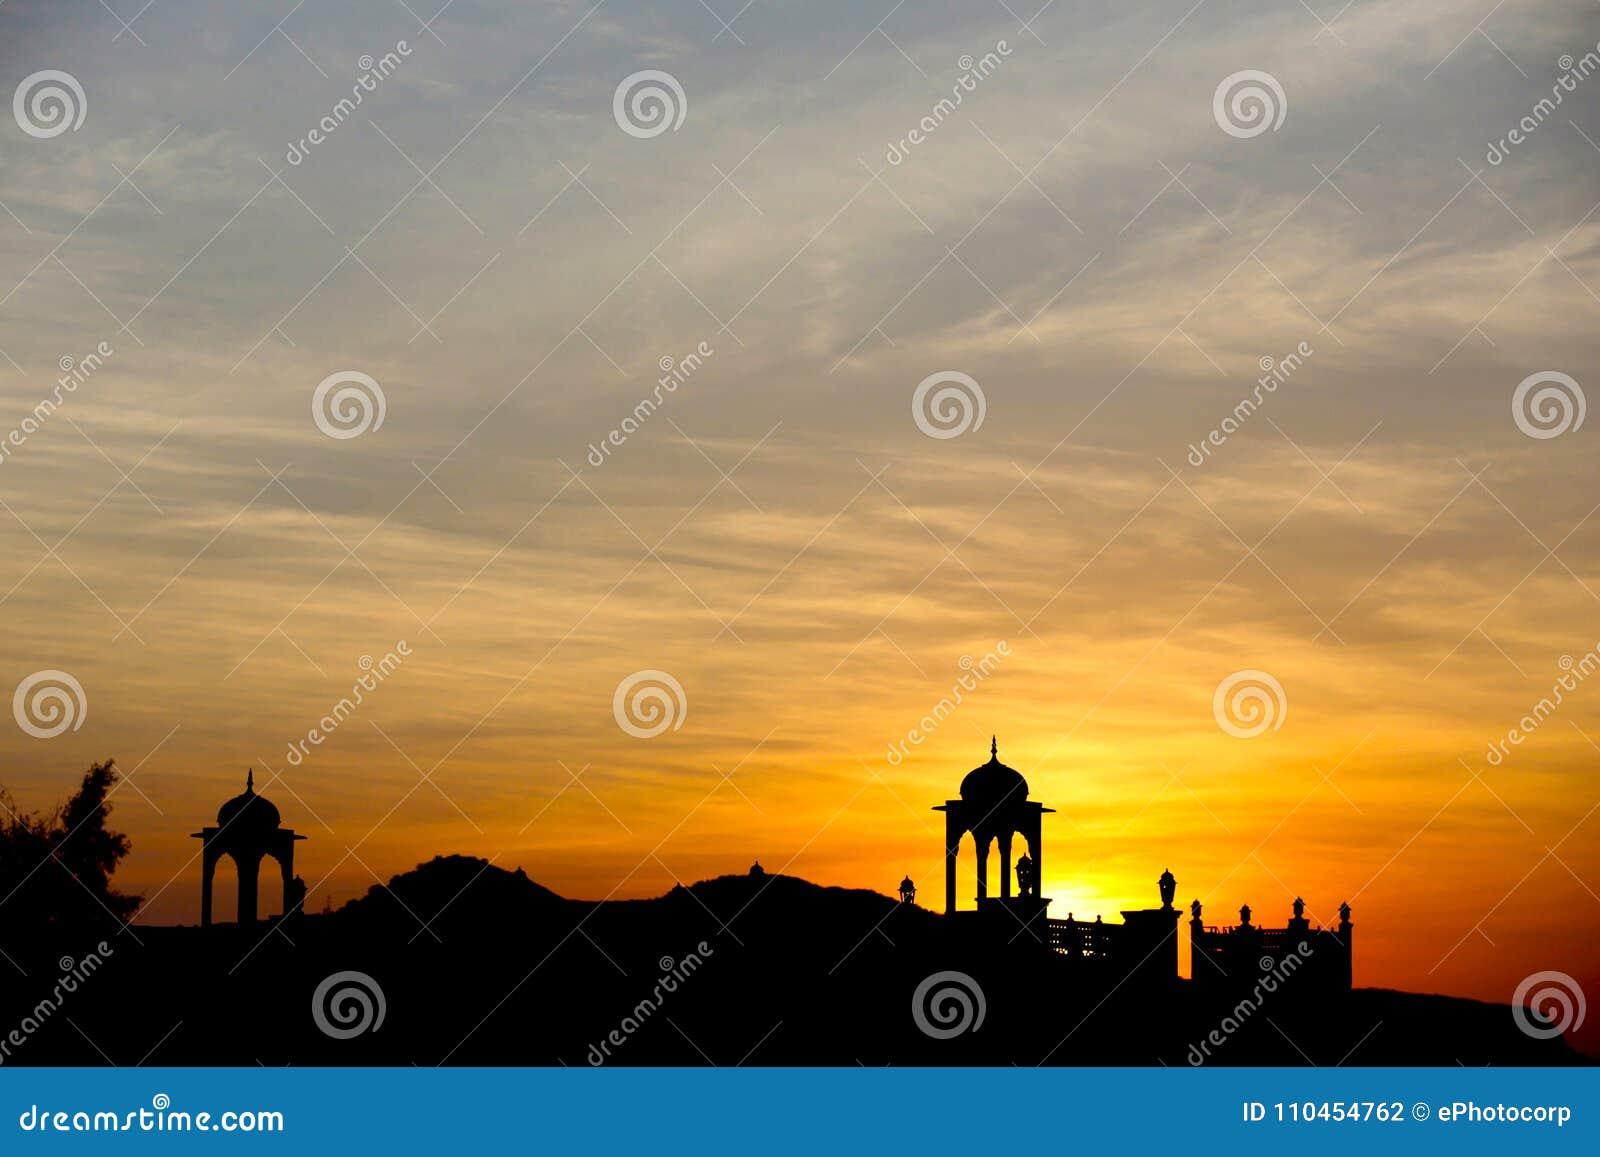 Kontur av templet med solen